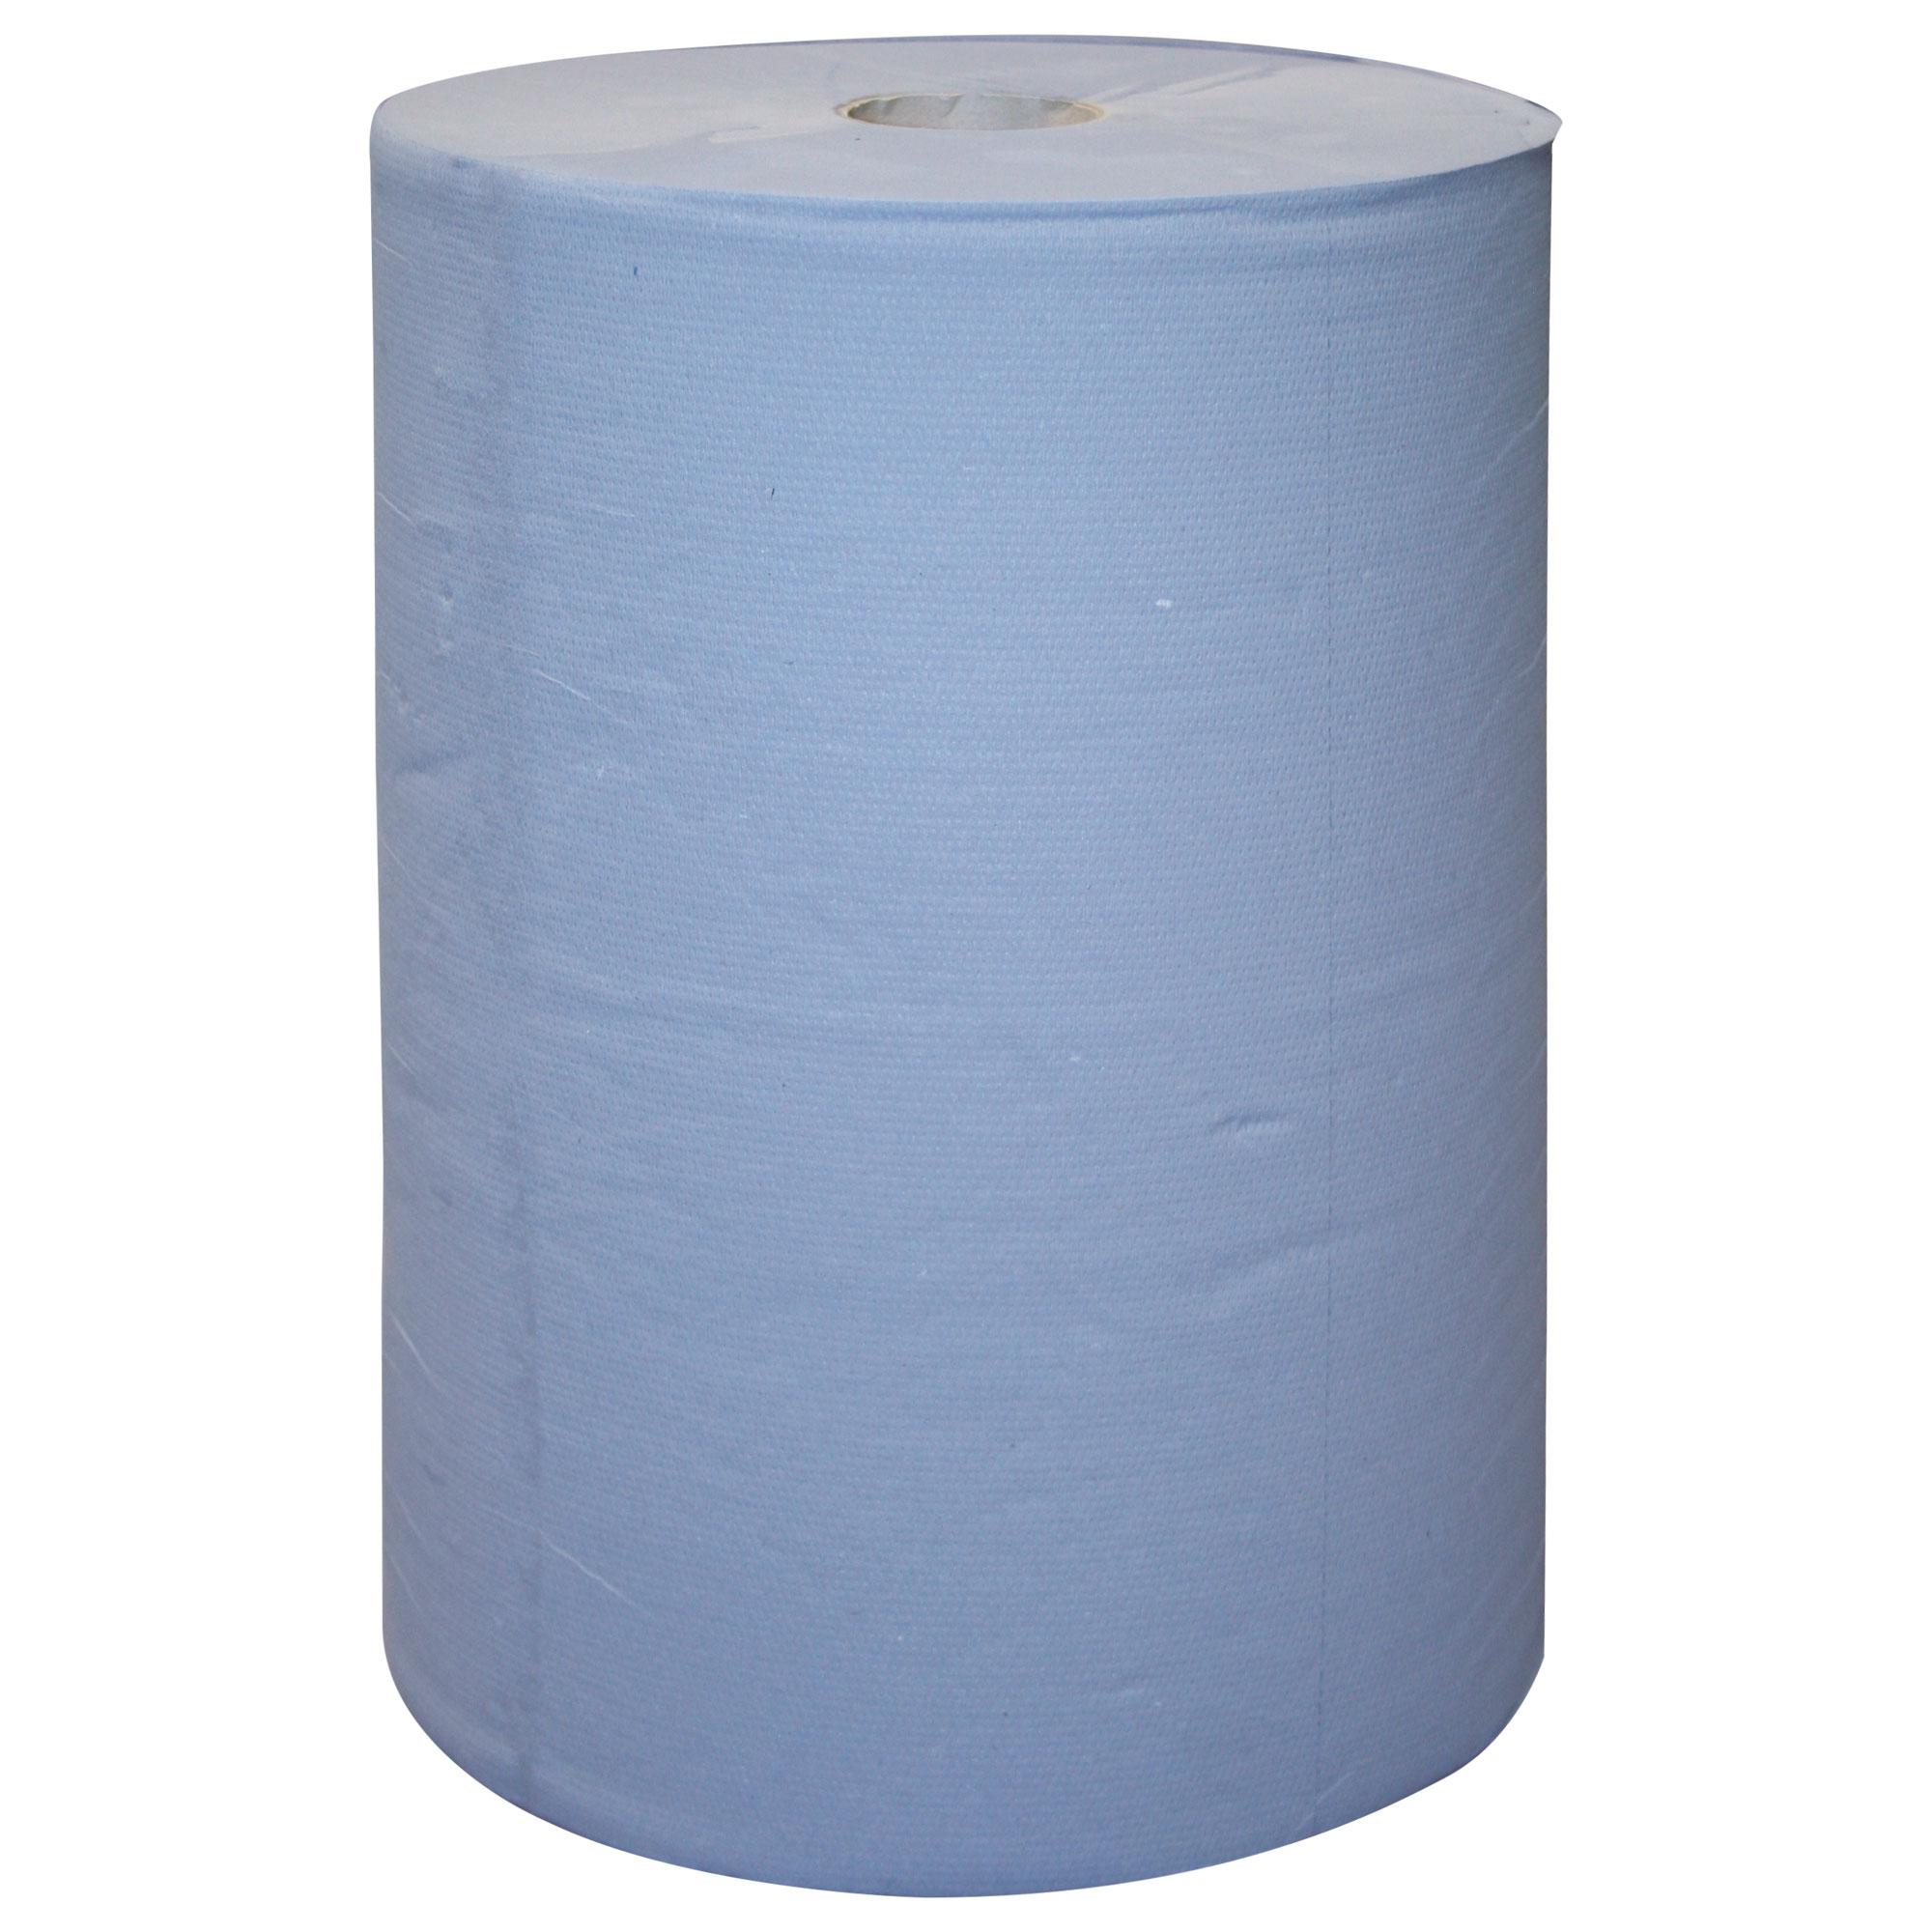 Putzpapierrolle, blau, 2 Rollen